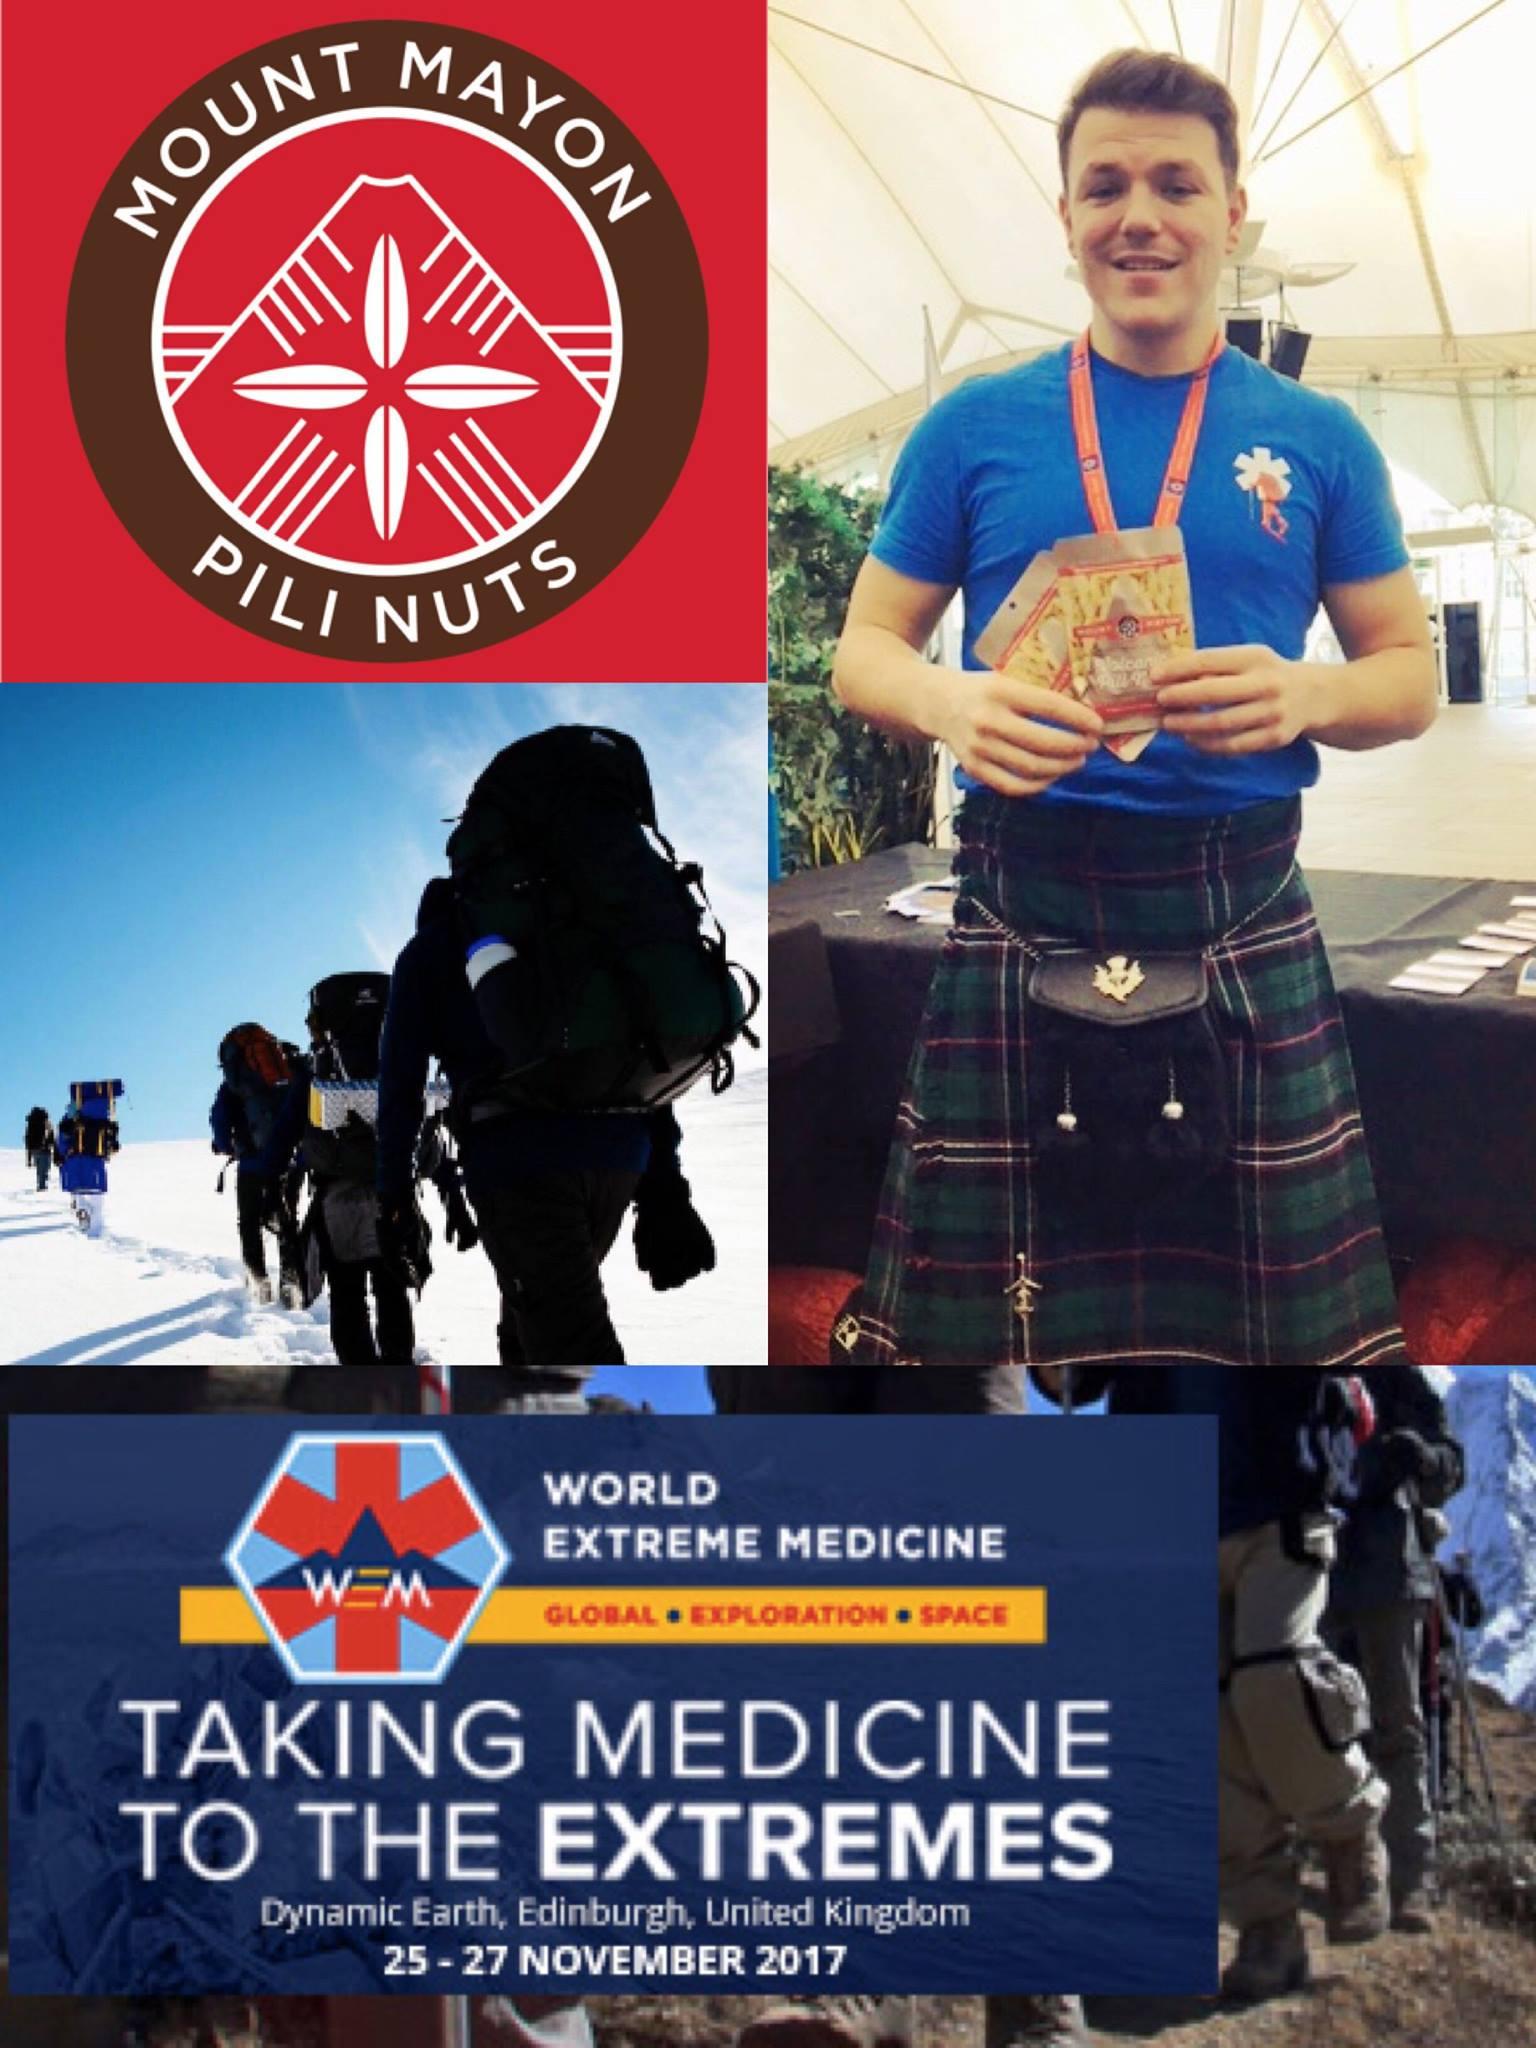 World Extreme Medicine & Mount Mayon Pili Nuts